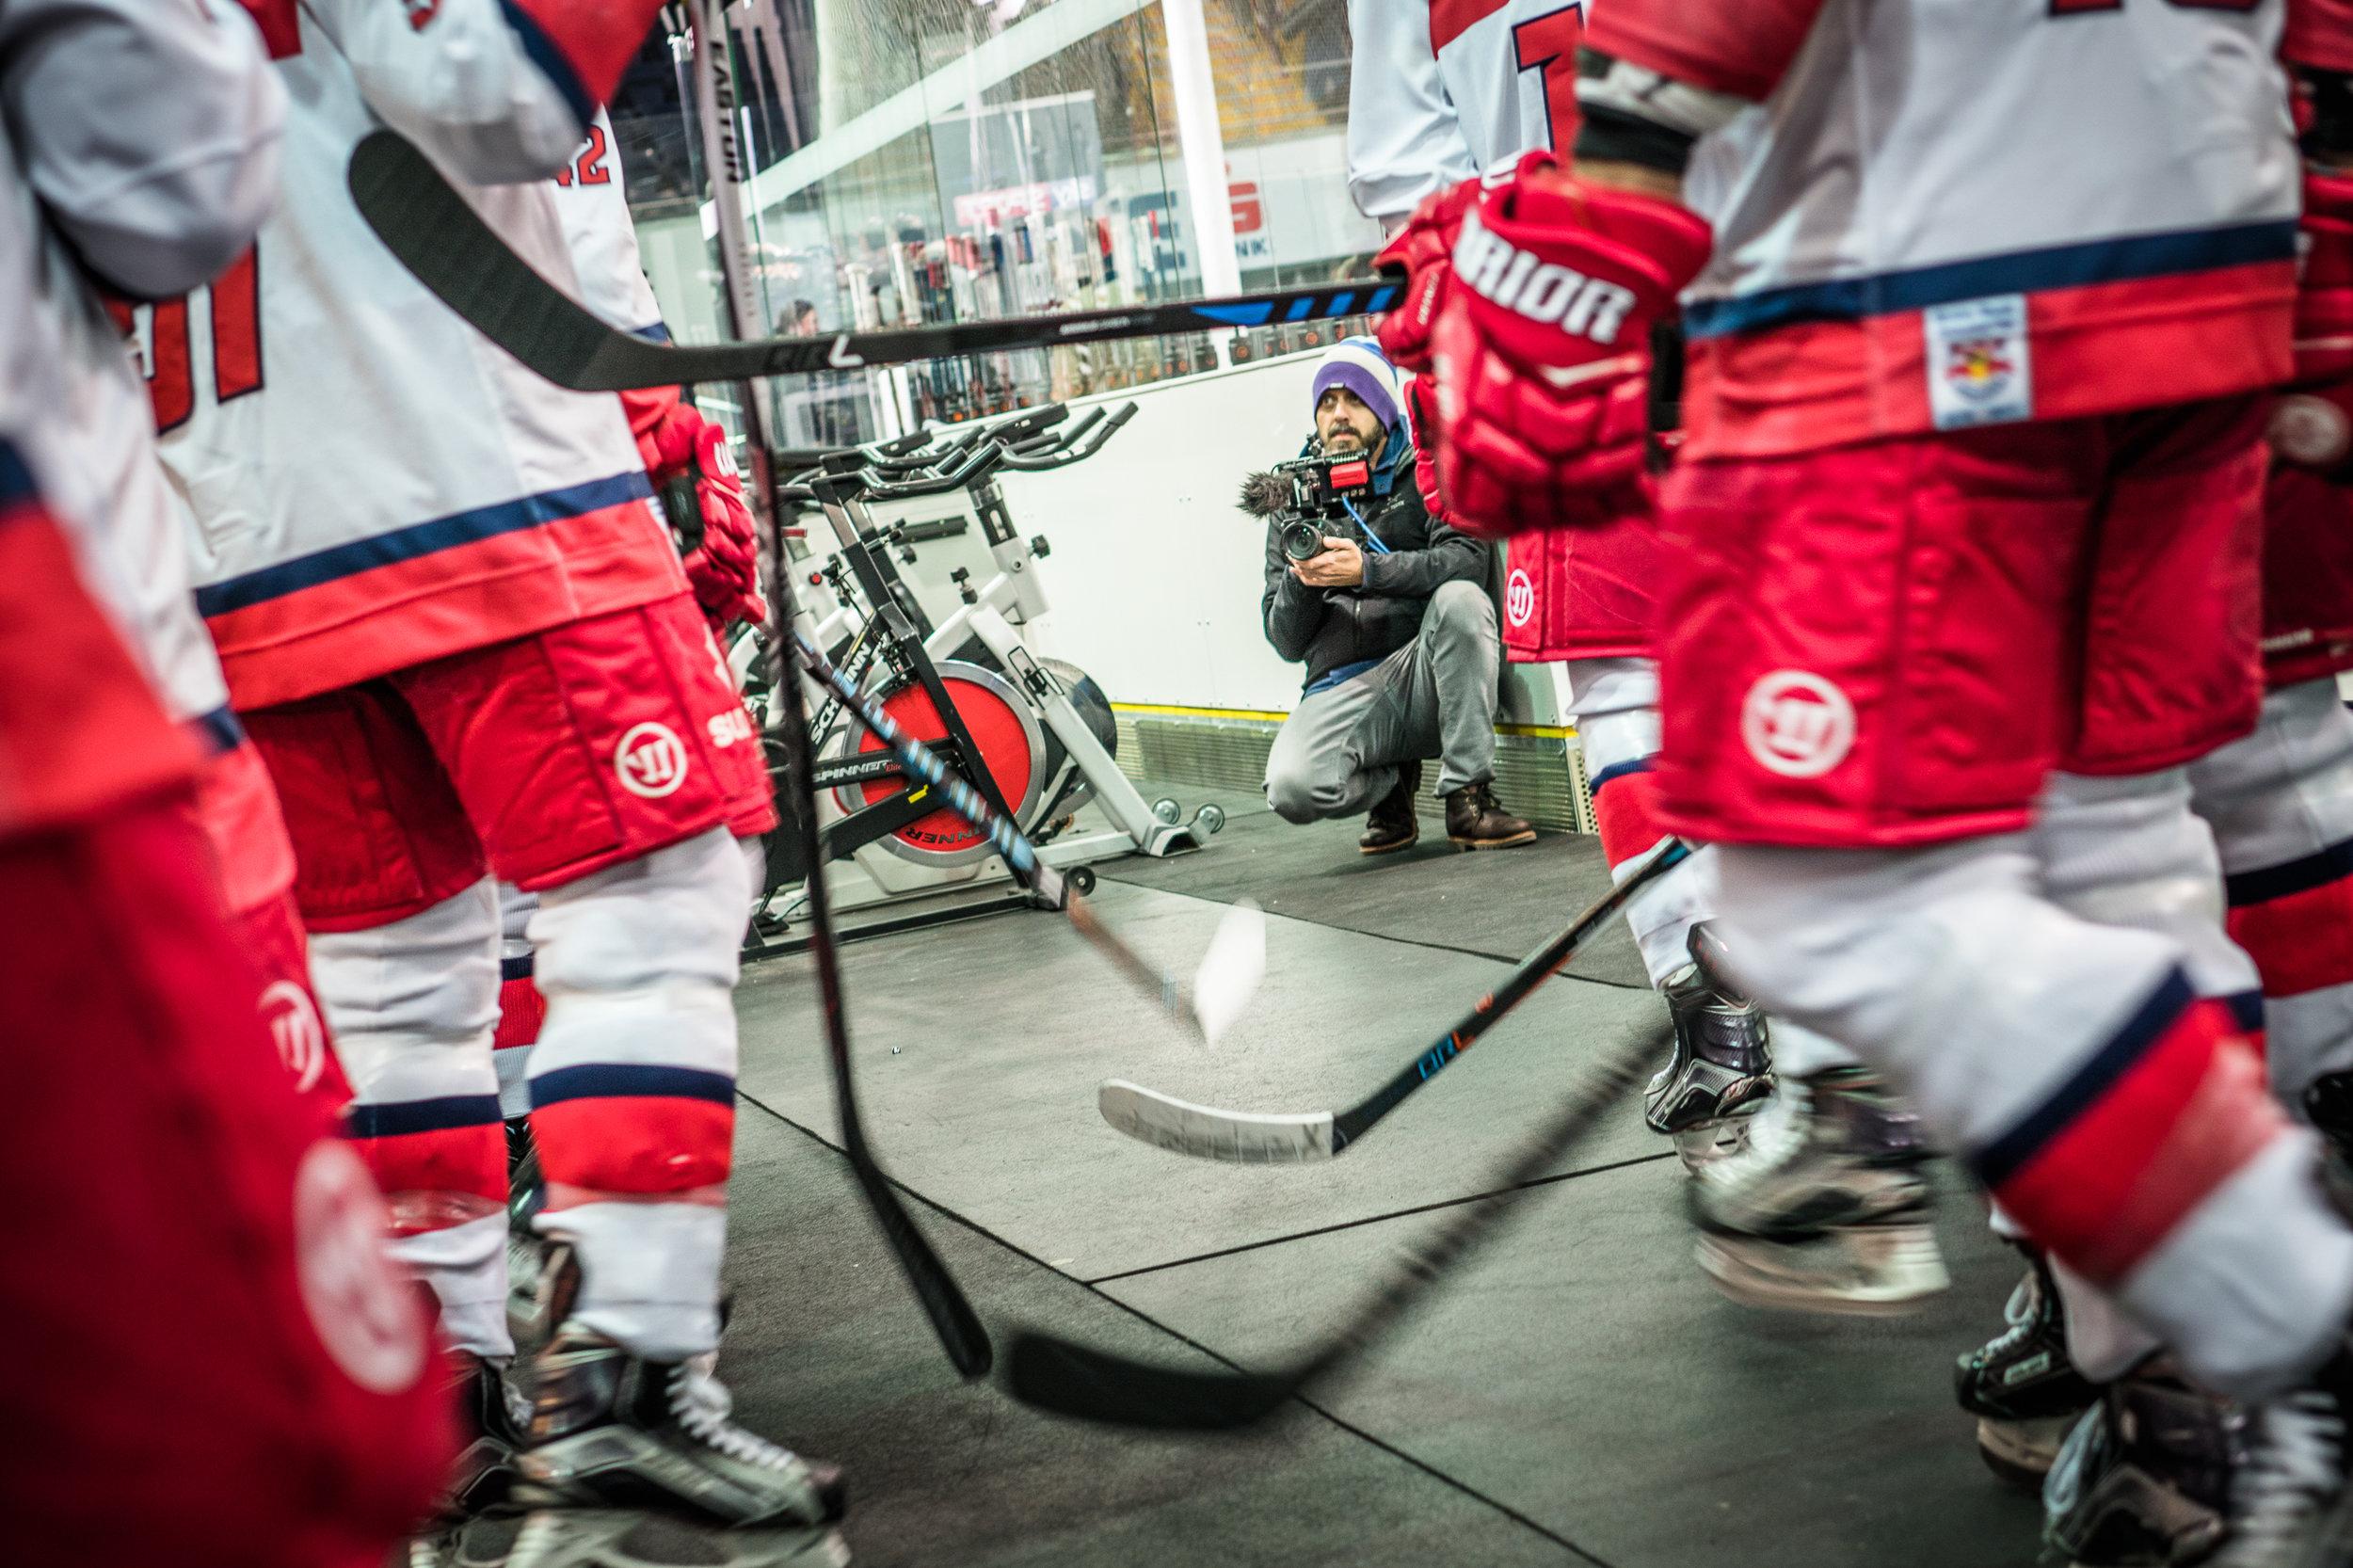 EpicMinutes-Behind-RedBull-Eishockey-WEB-by-BAUSE-024.jpg